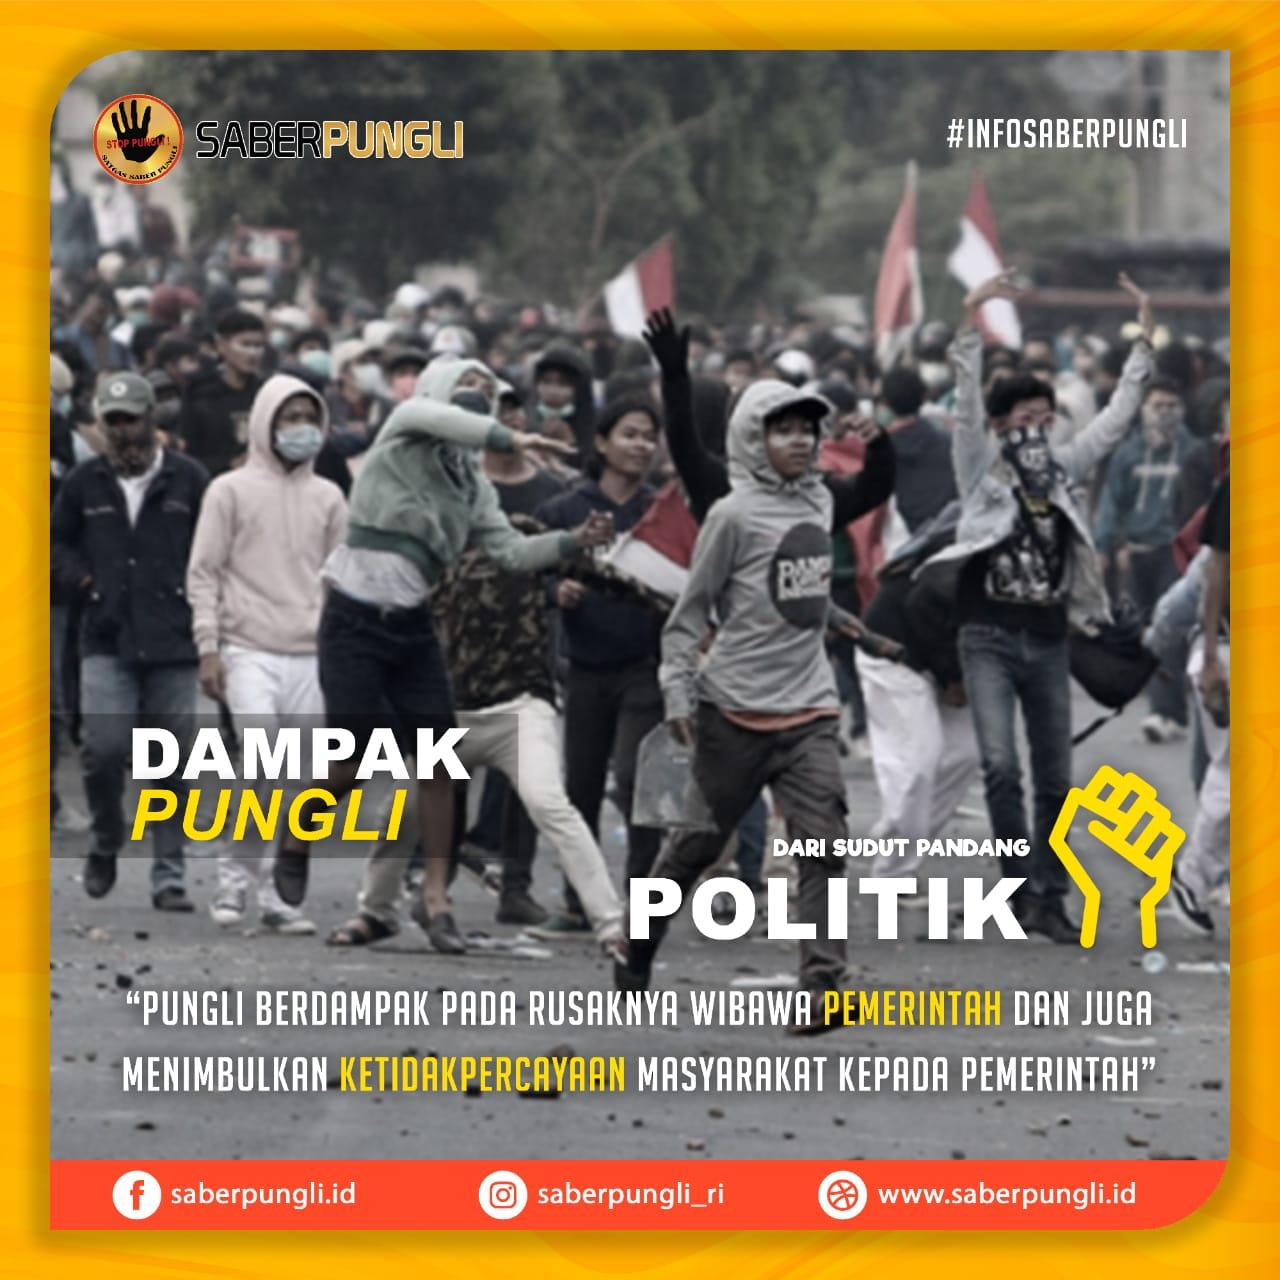 02 - DAMPAK PUNGLI DARI SUDUT PANDANG POLITIK